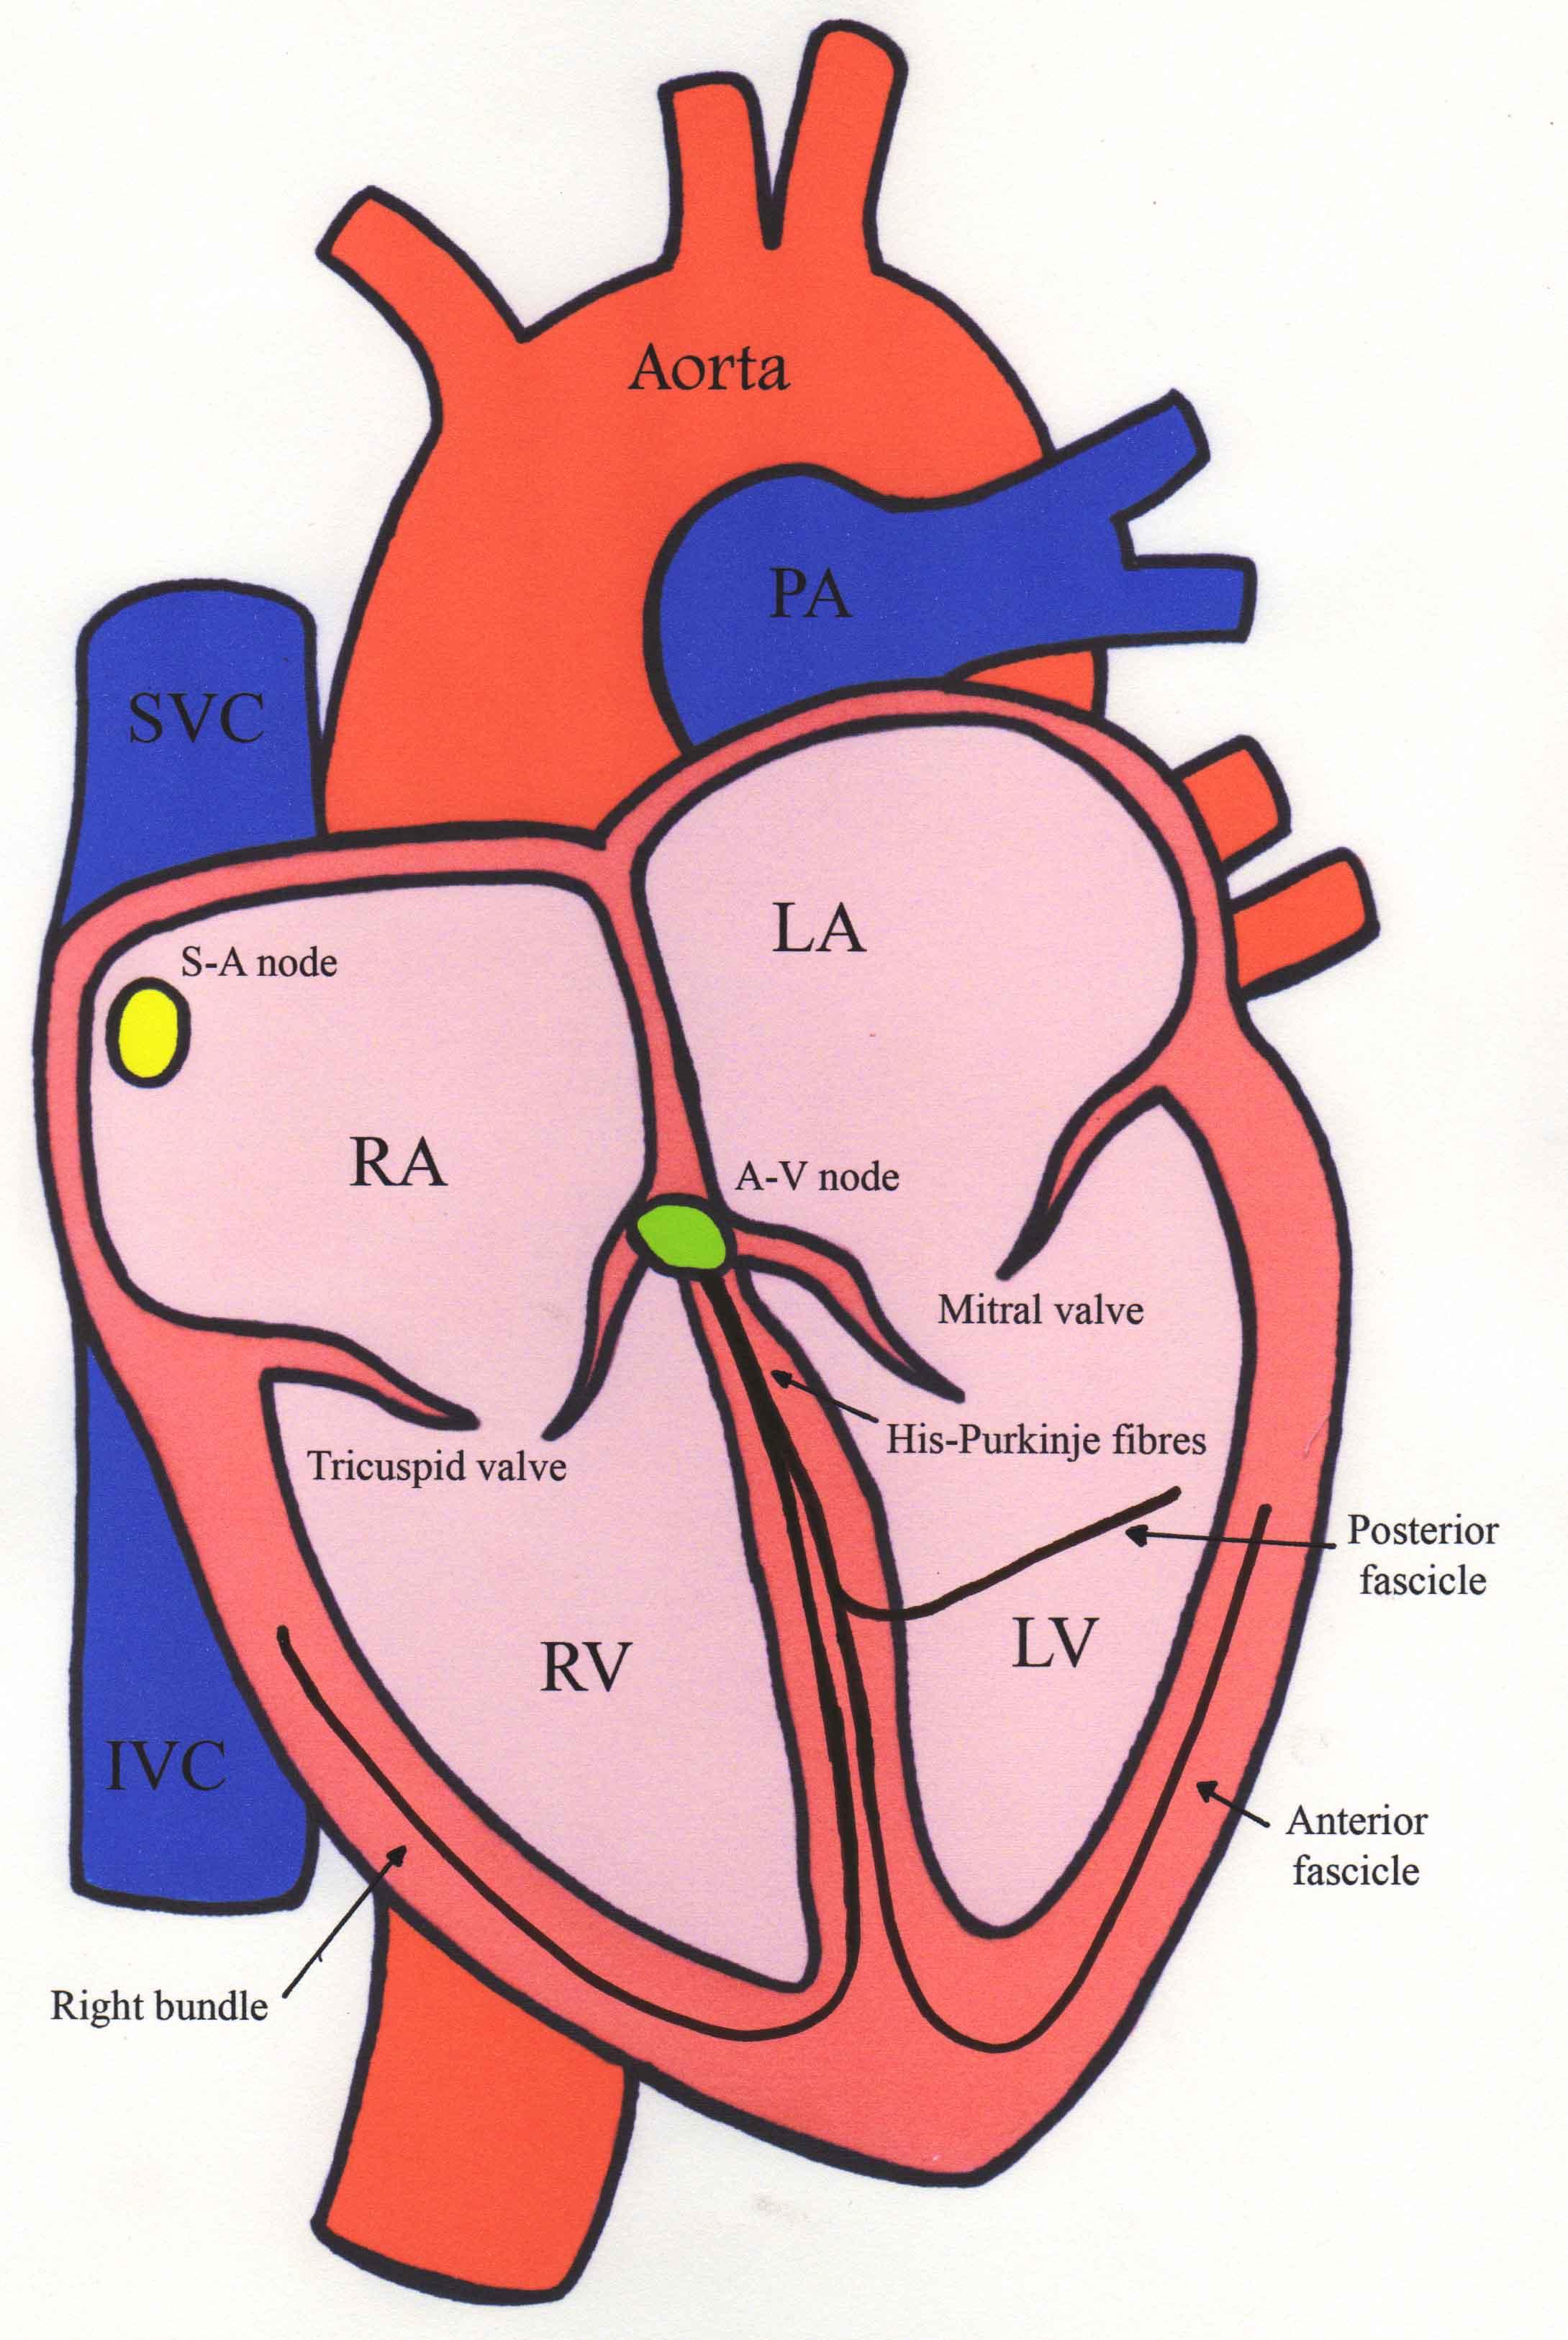 Heart diagram svt electrical work wiring diagram supraventricular tachycardia rh rbain org uk heart diagram sheet heart diagram song ccuart Gallery